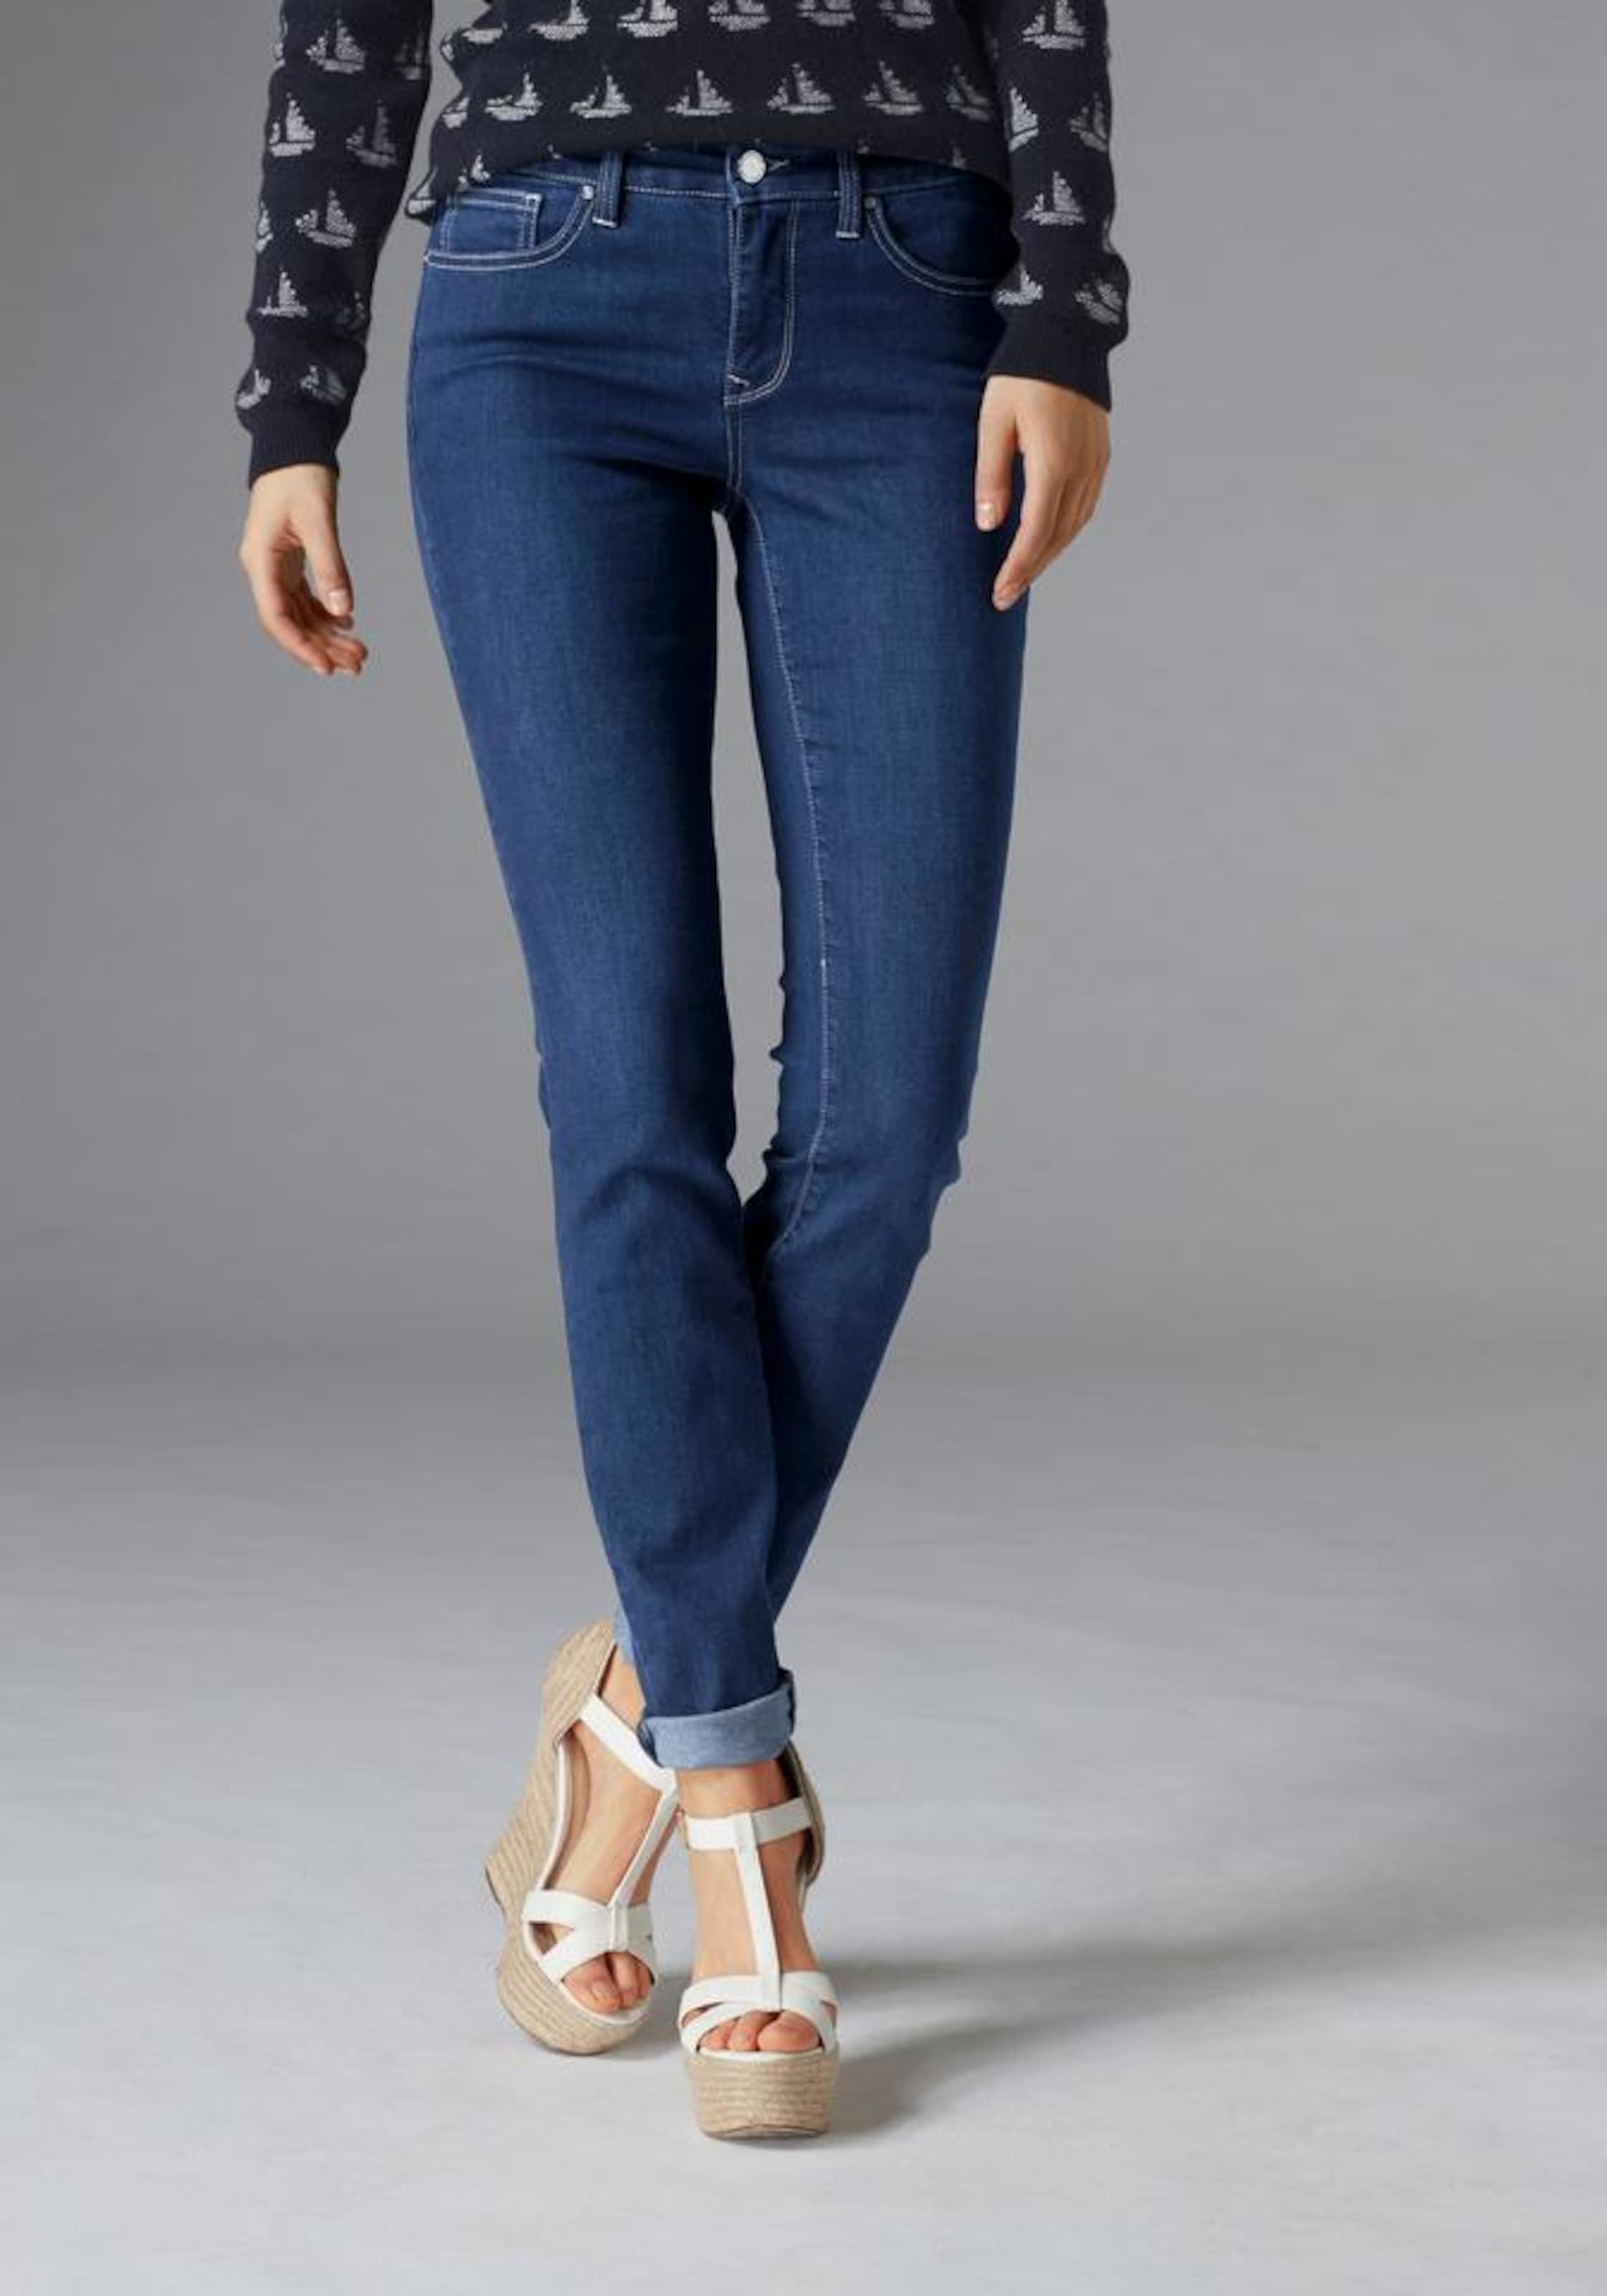 Jeans Guido Guido Maria Kretschmer fit Slim Jeans Slim fit Kretschmer Maria EaA5w